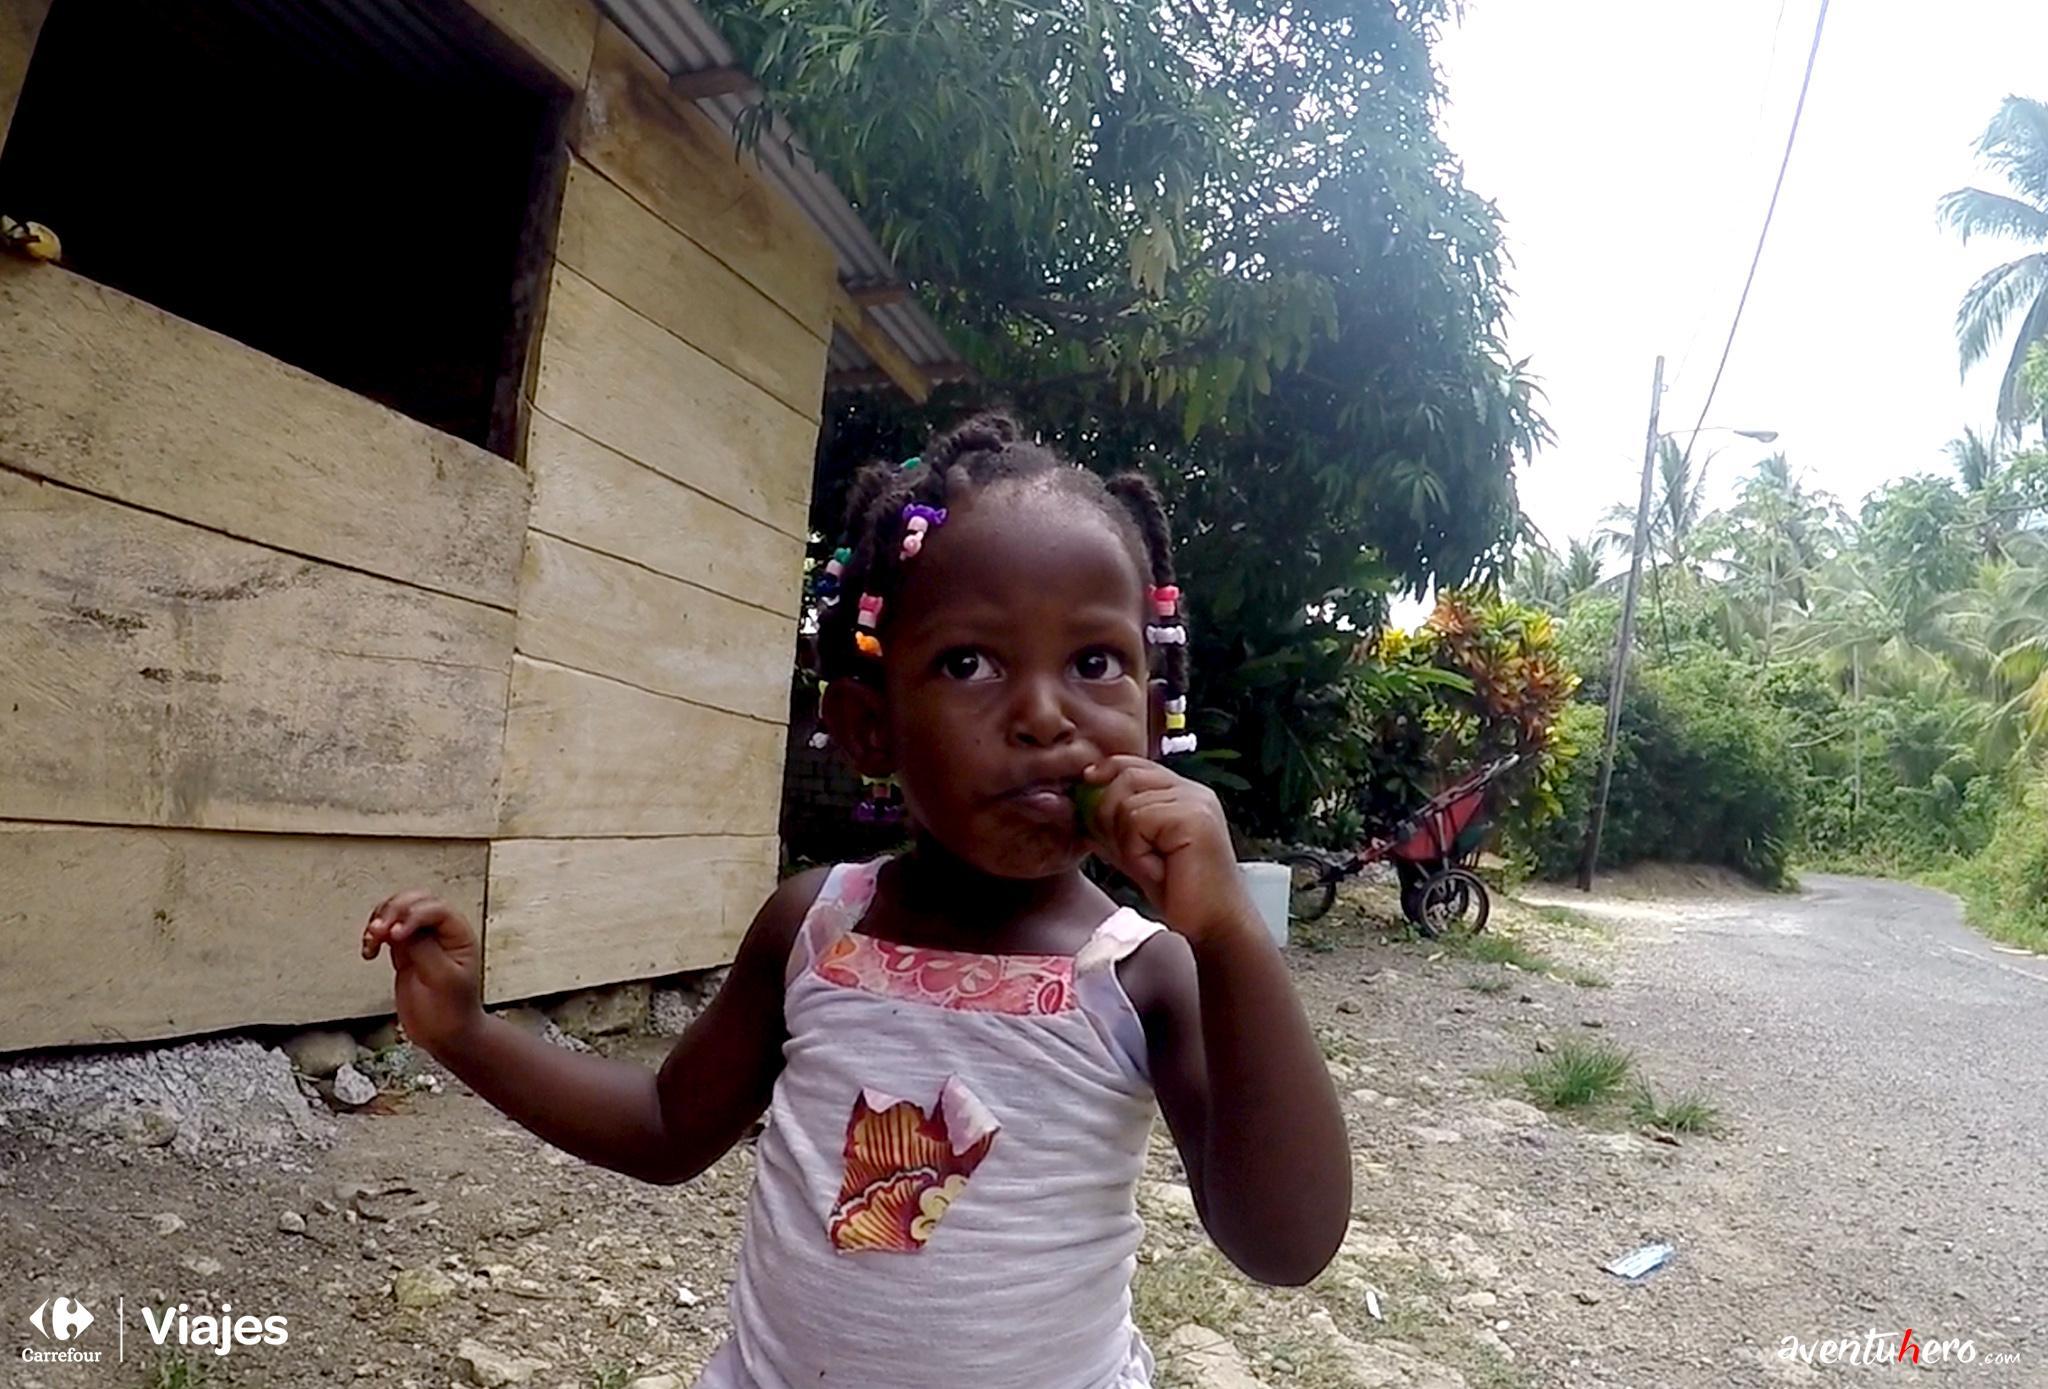 Aventuhero Jamaica Hija pequena Michelle